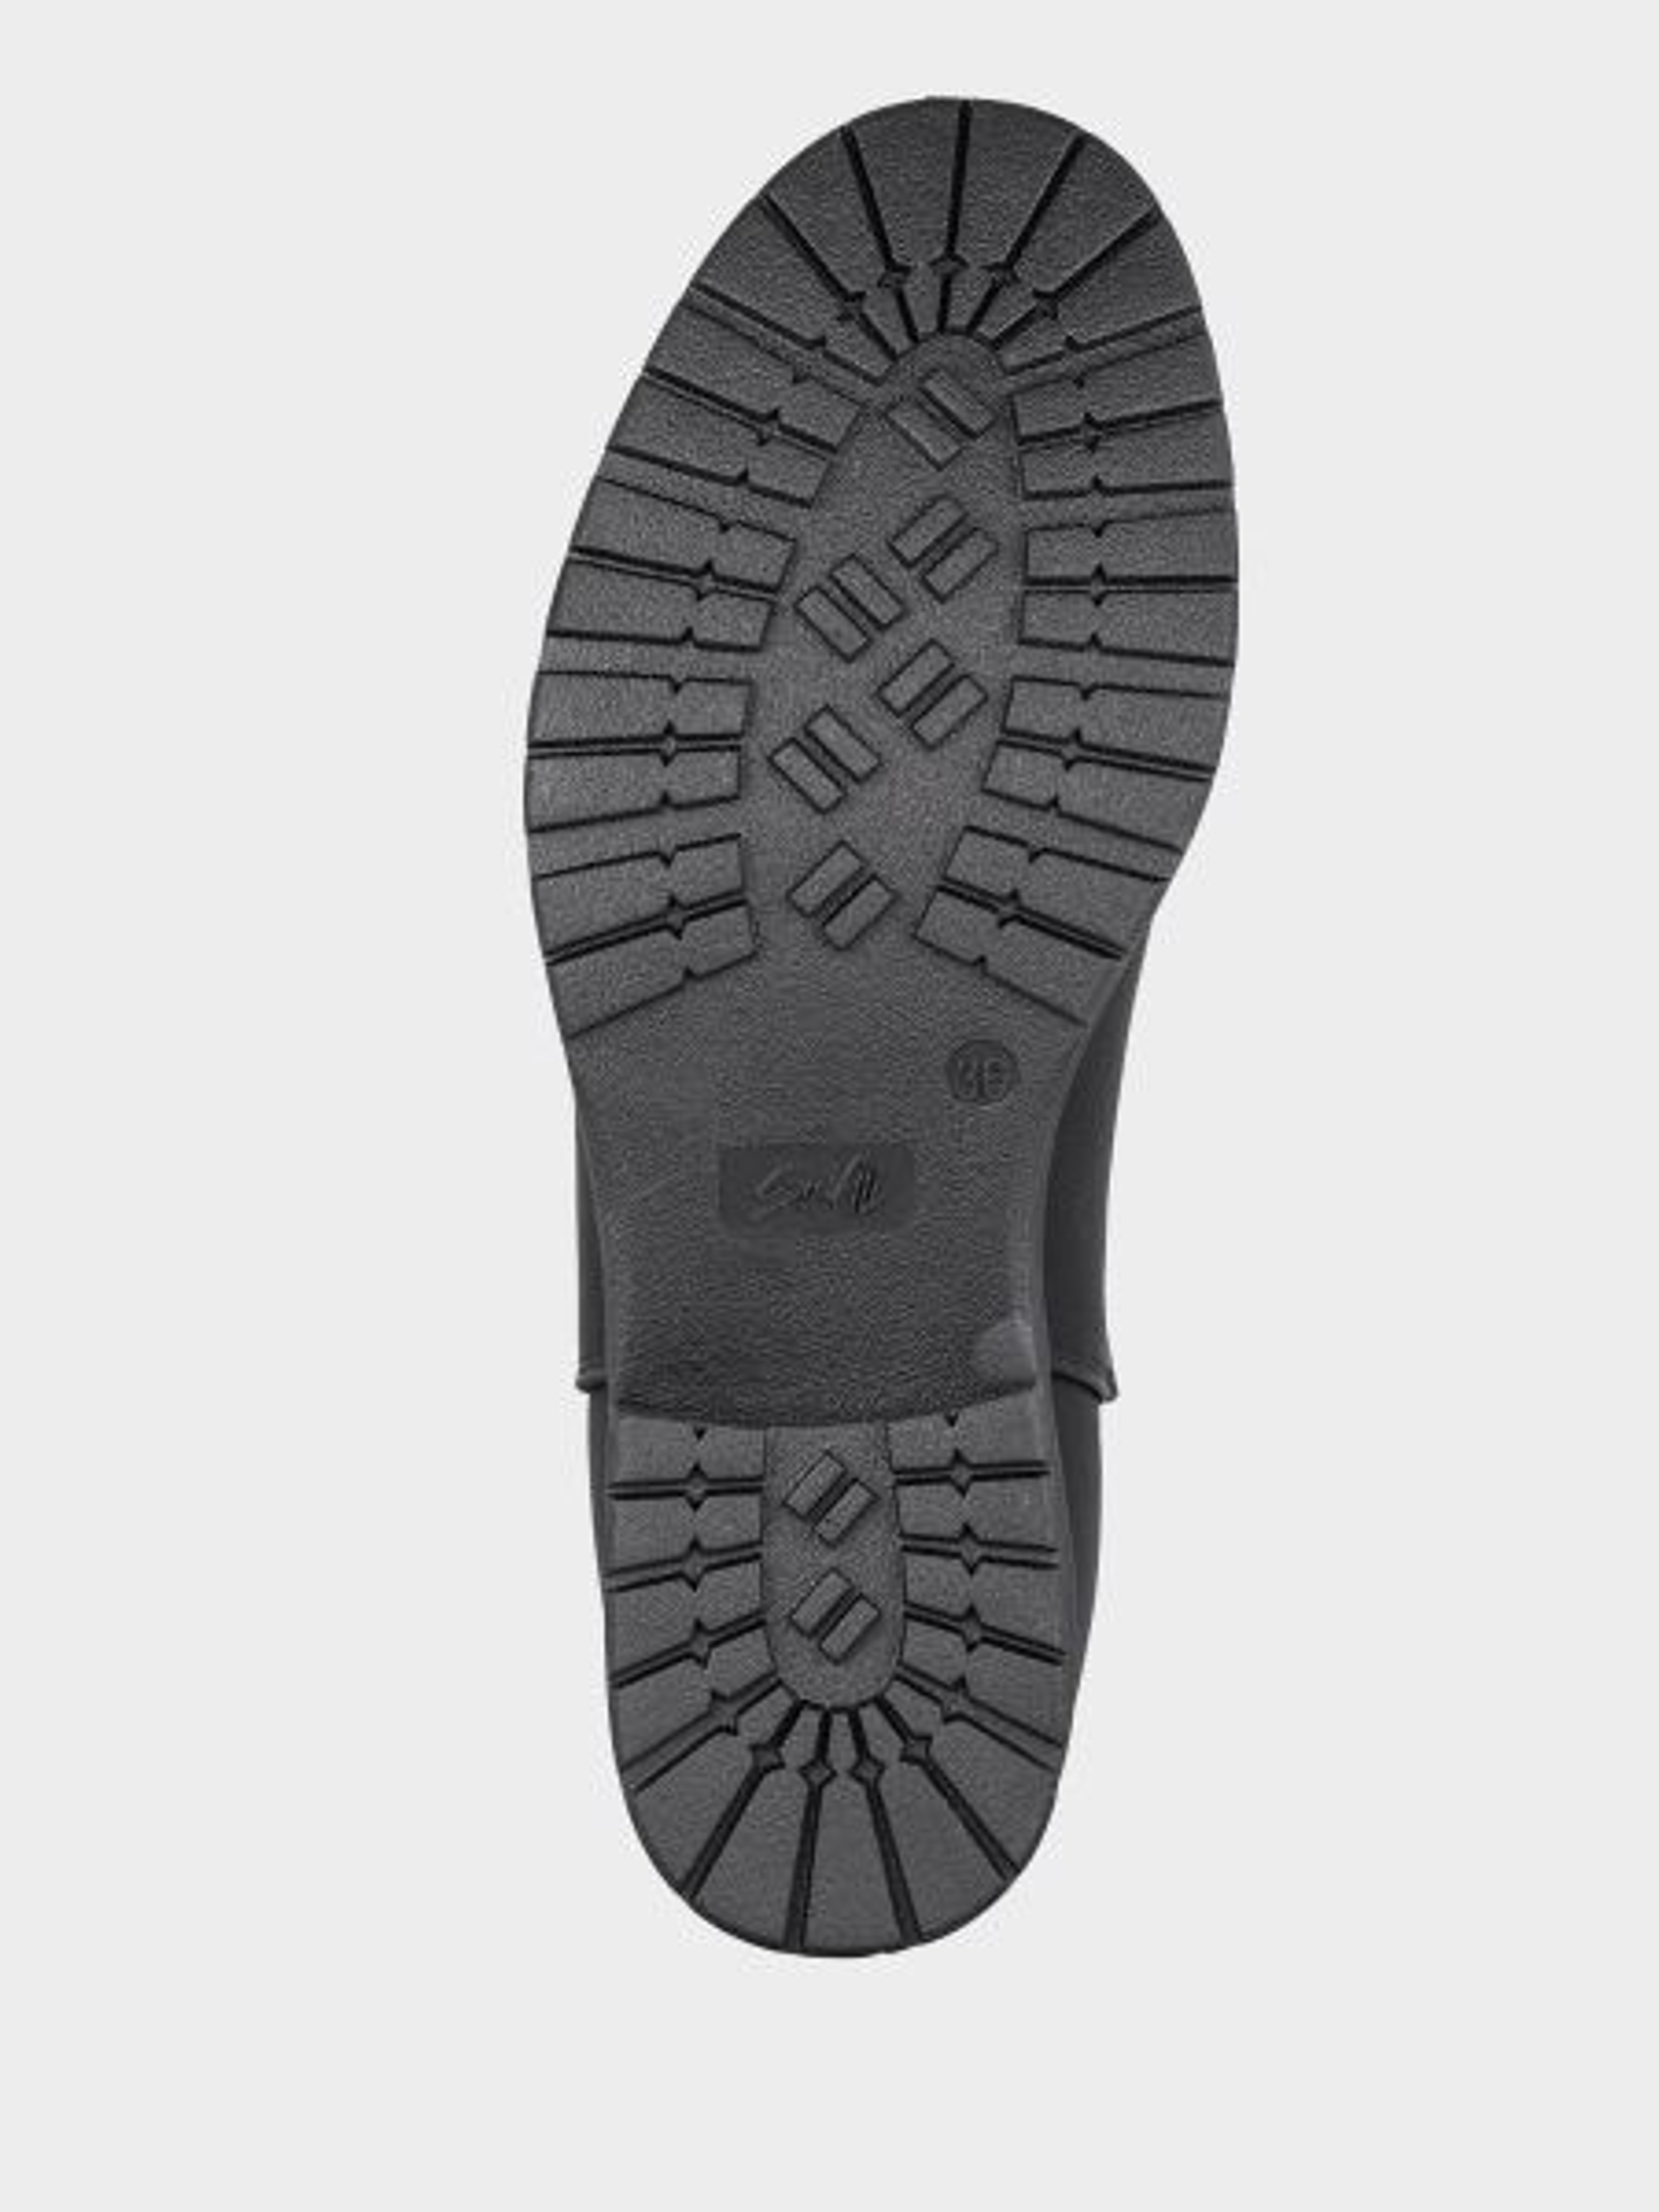 Ботинки женские M Wone OI141 цена, 2017